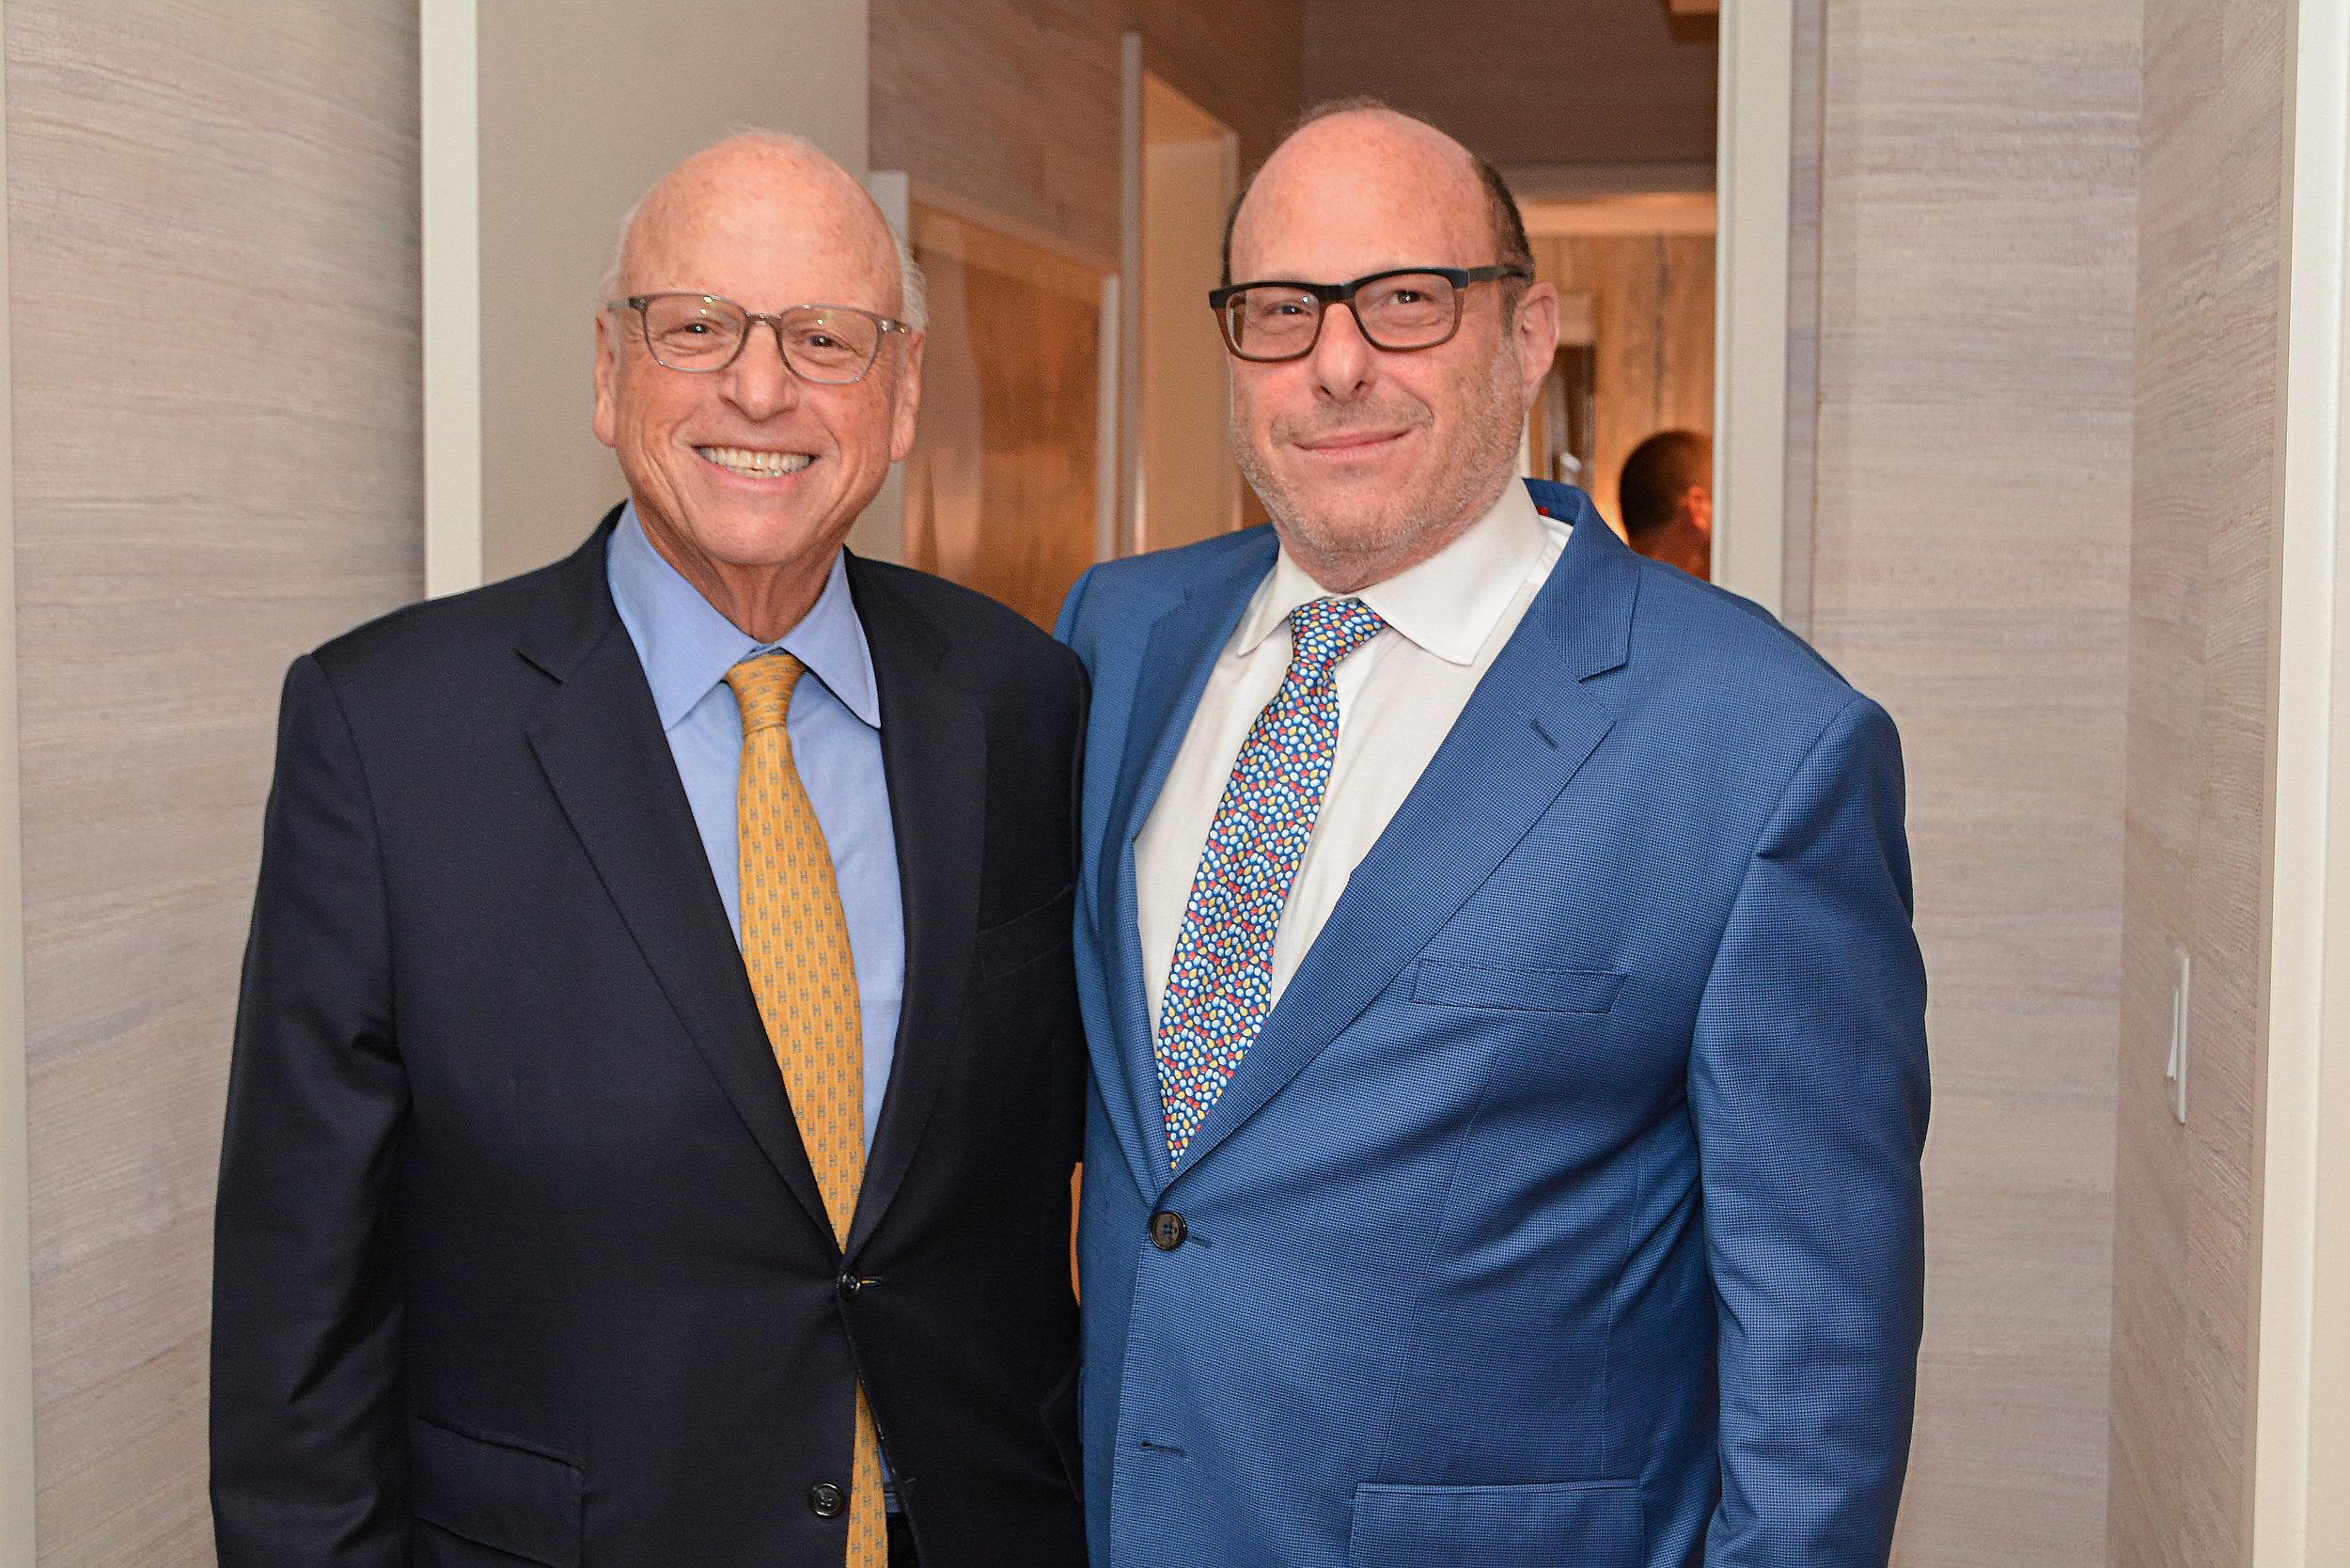 Horward Lorber, Chairman of Douglas Elliman and Bruce Ehrmann of Douglas Elliman